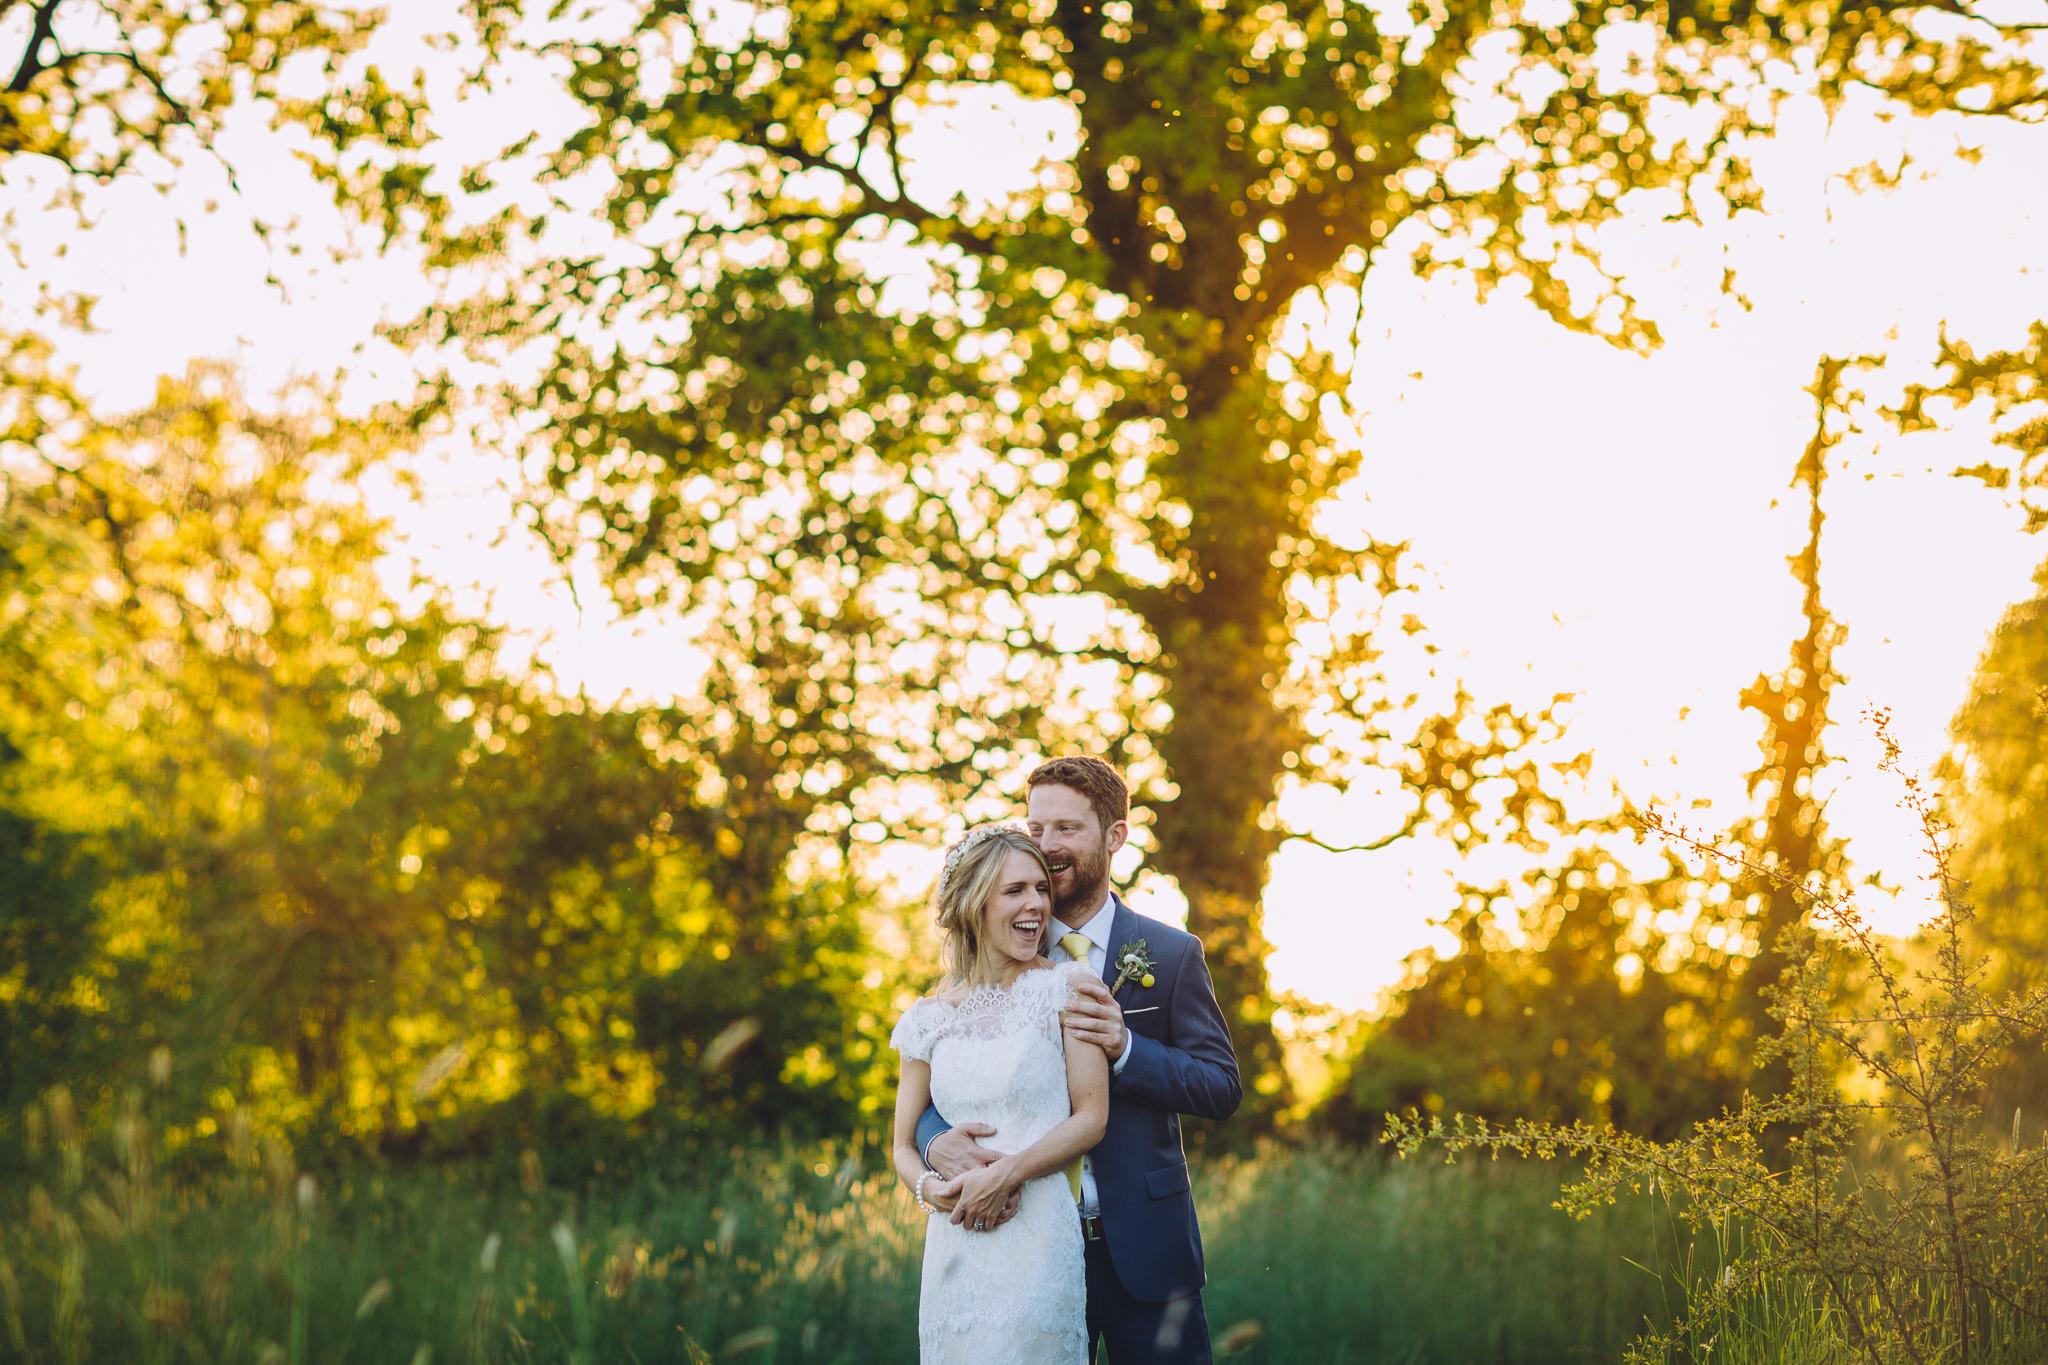 Owen-House-Barn-Wedding-Photographer-Cheshire-90076